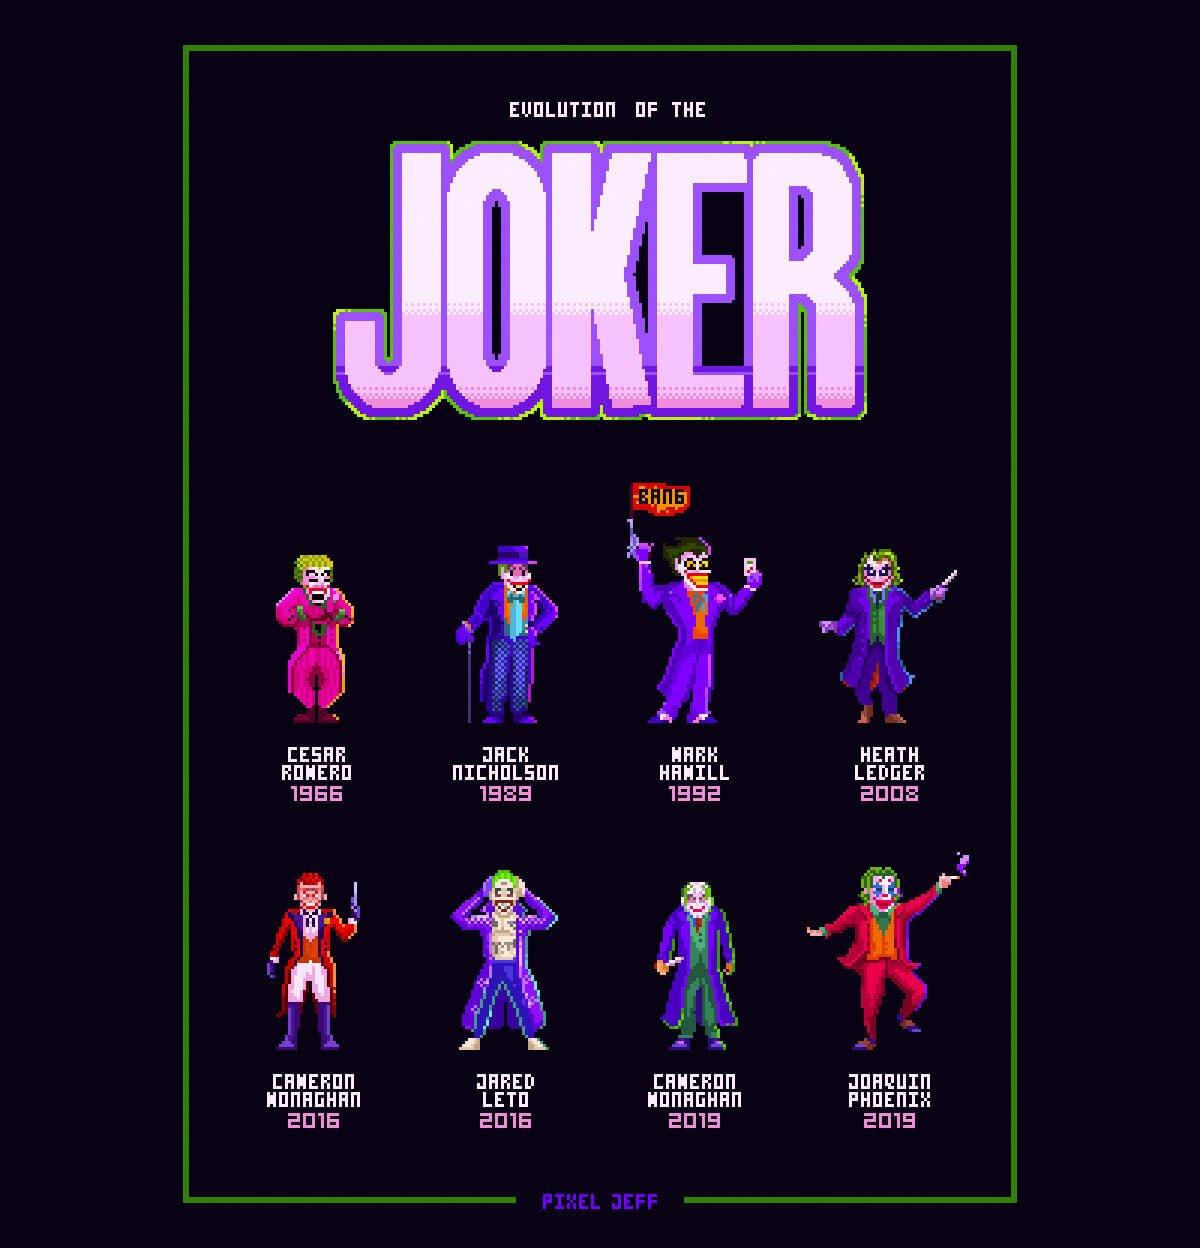 Evolution of the Joker by Pixel Jeff